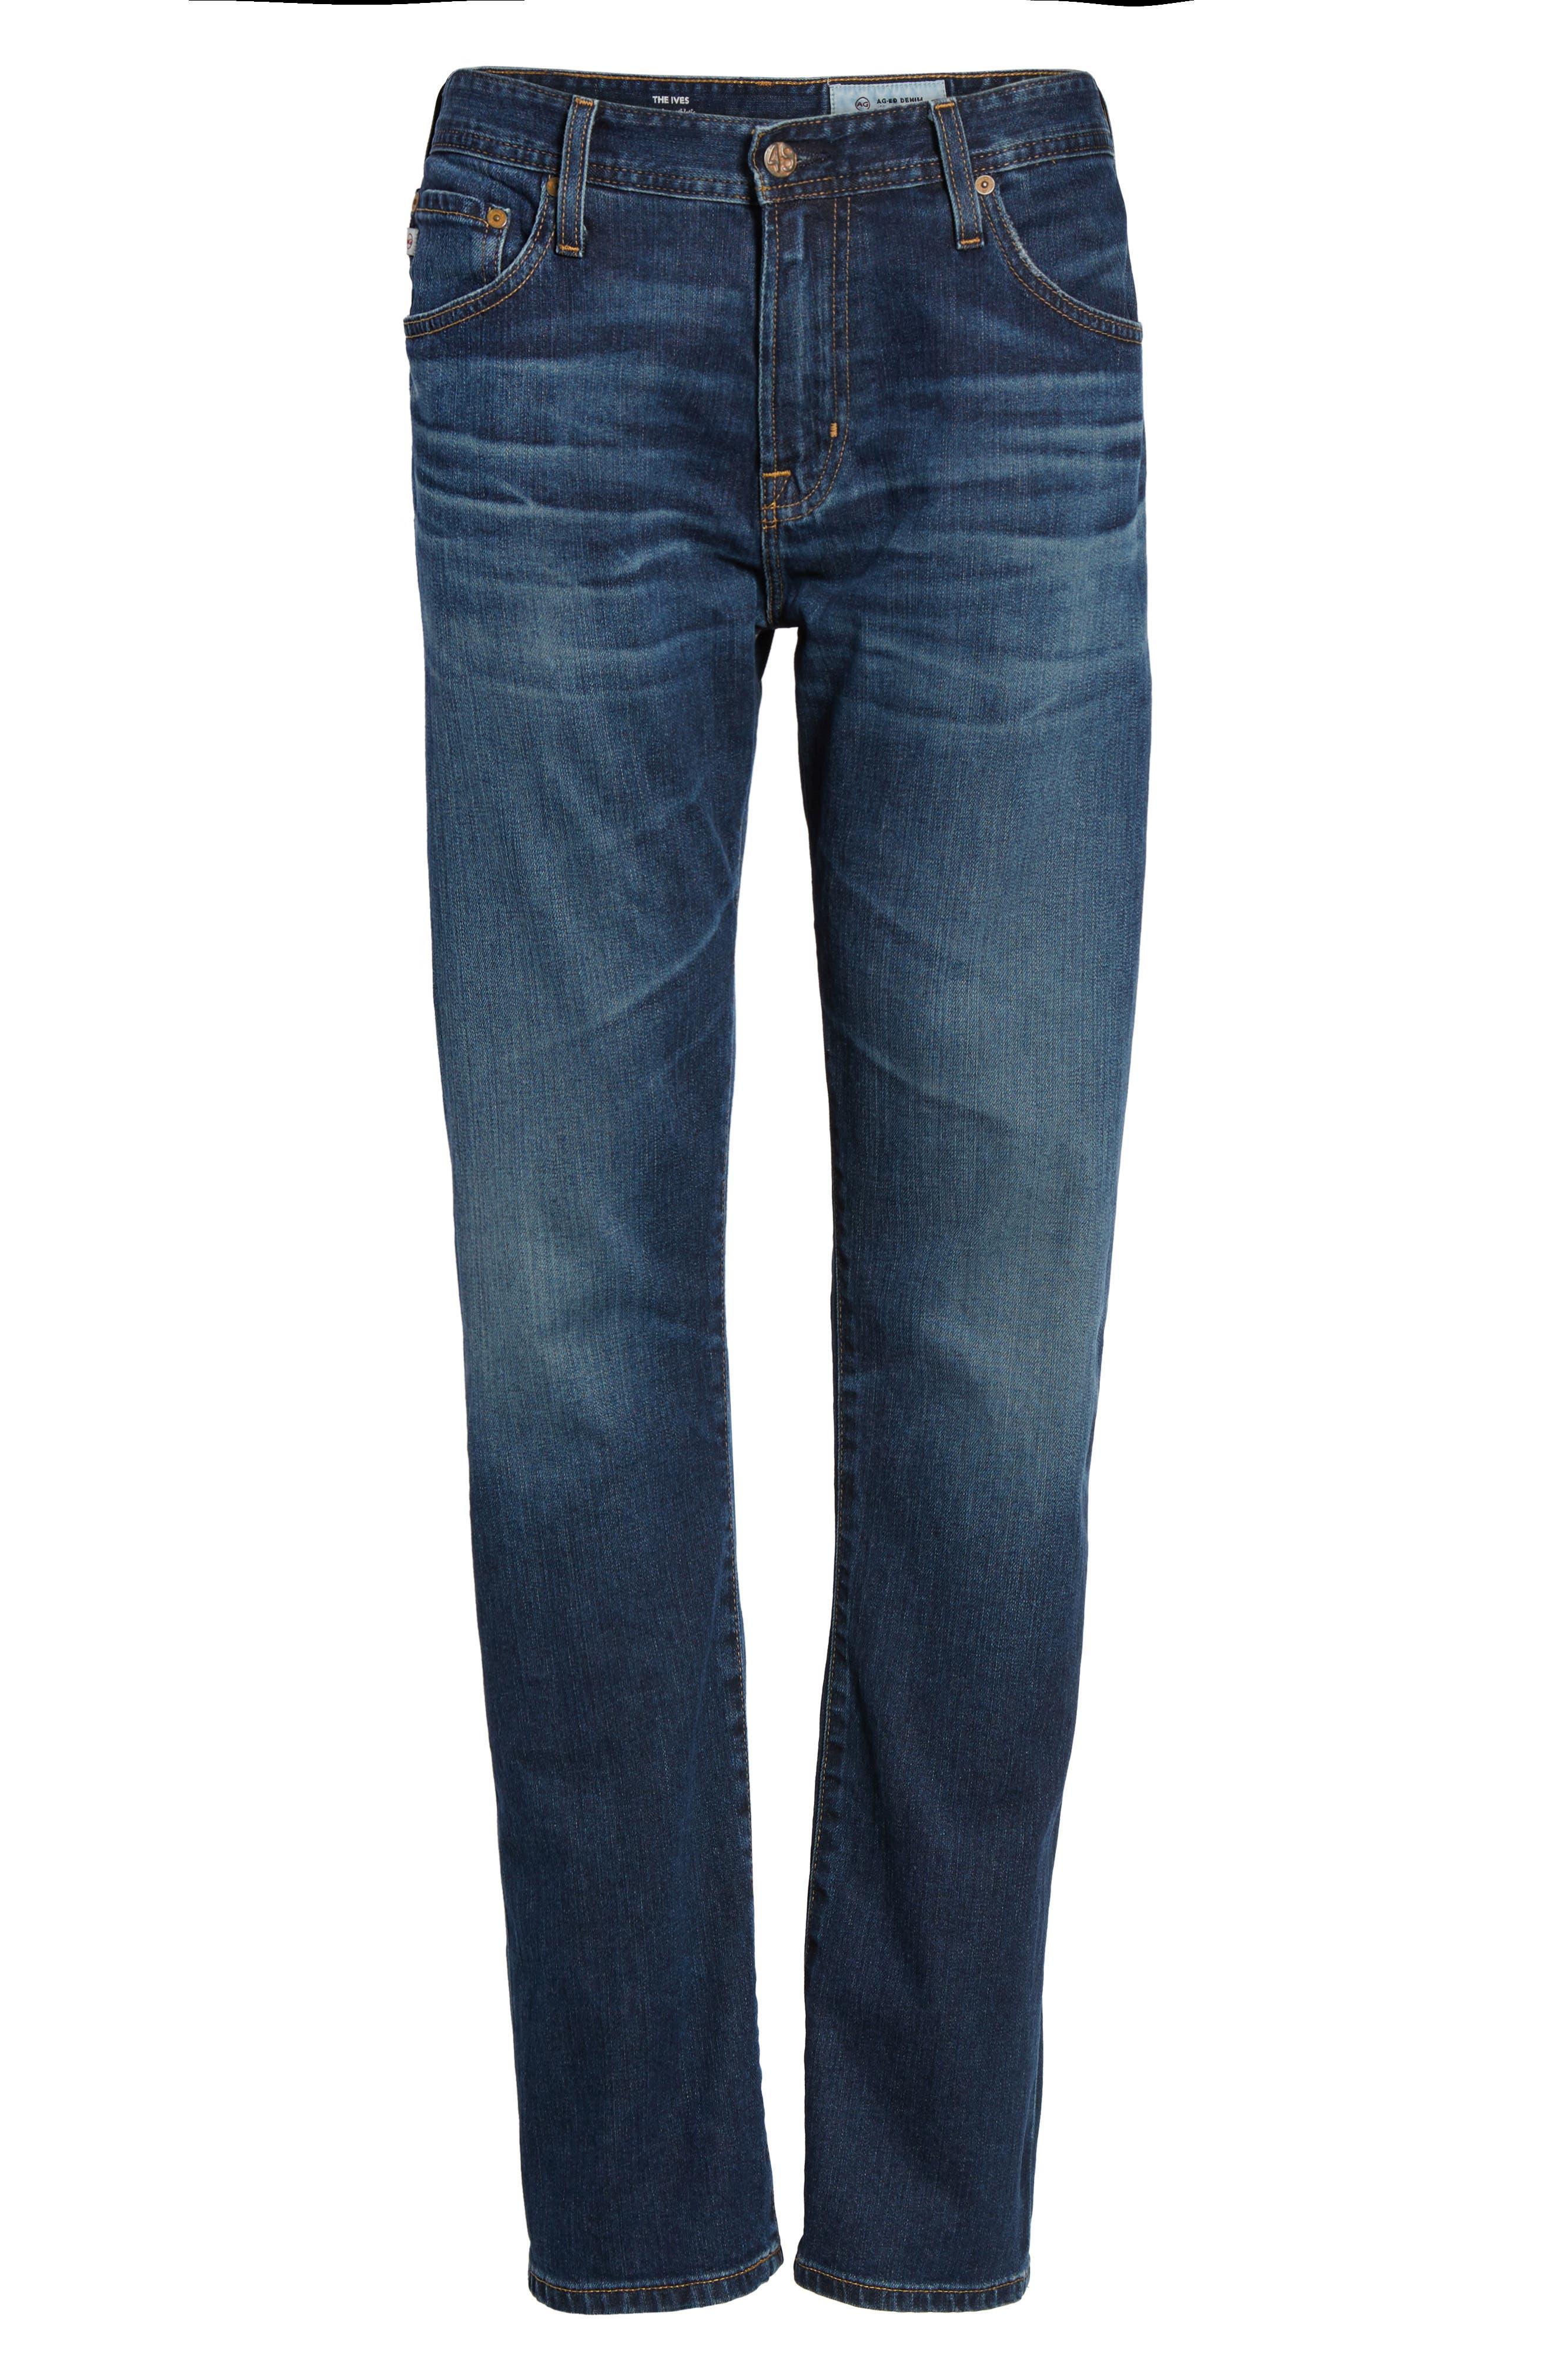 Ives Straight Leg Jeans,                             Alternate thumbnail 6, color,                             478